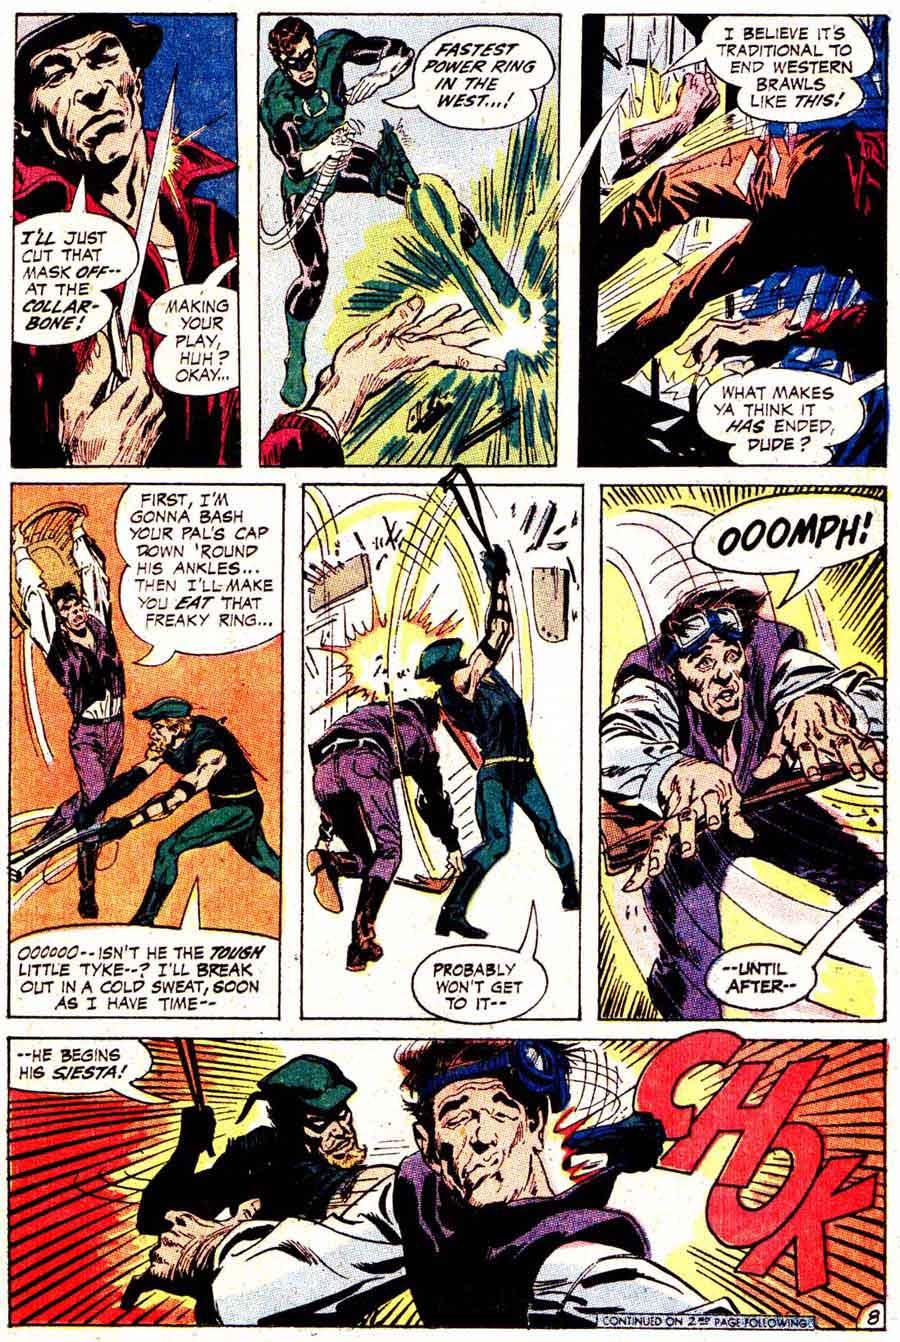 Green Lantern Green Arrow #78 dc comic book page art by Neal Adams